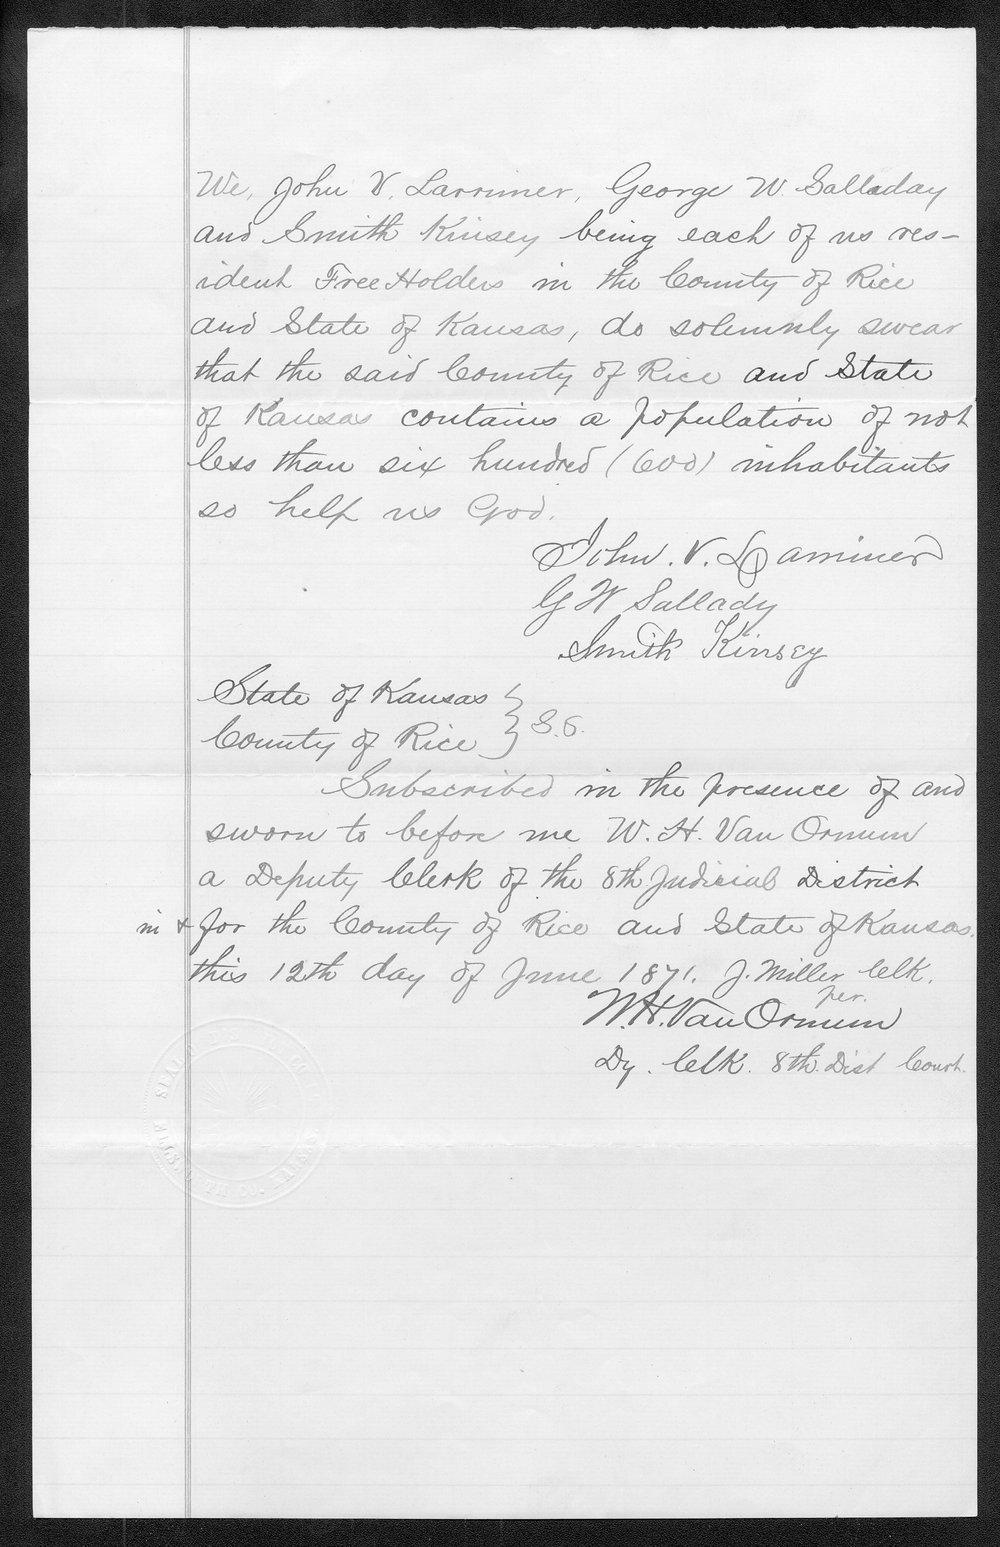 Rice County organization files - 8